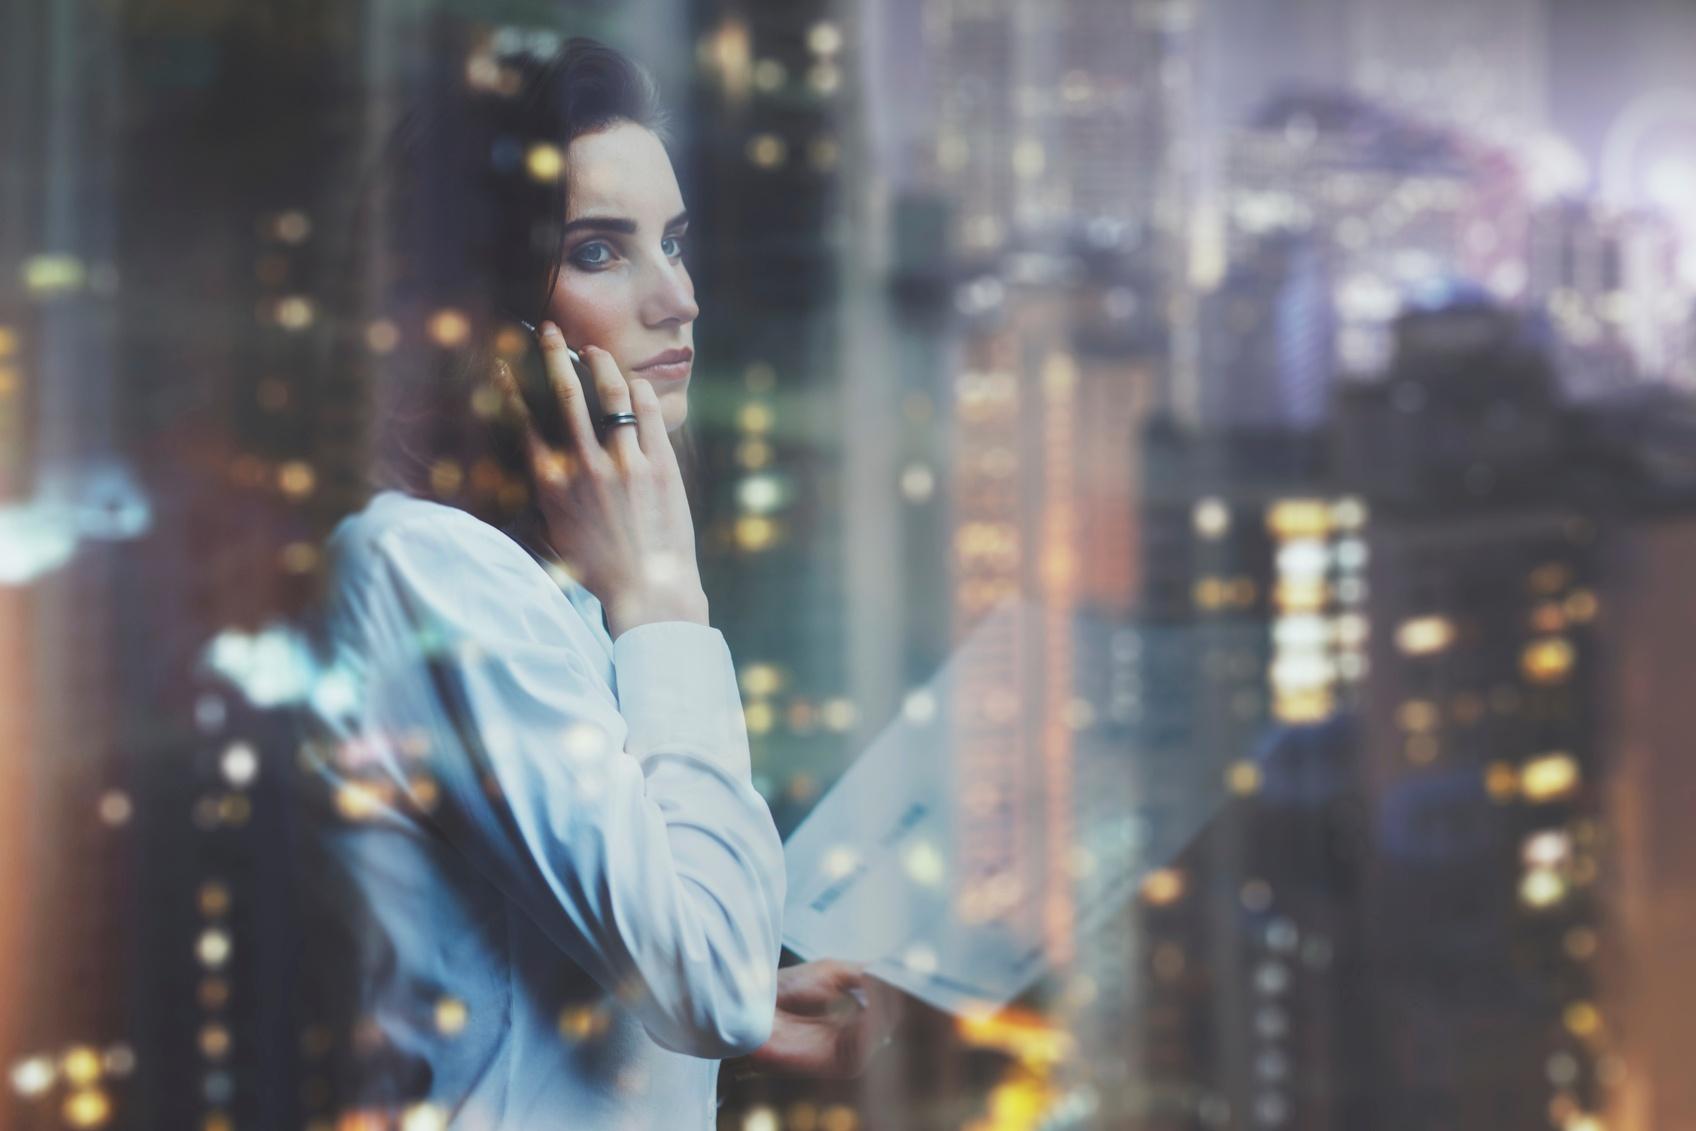 Photo-woman-wearing-white-shirt-talking-smartphone-and-holding-business-000089979727_Medium.jpg